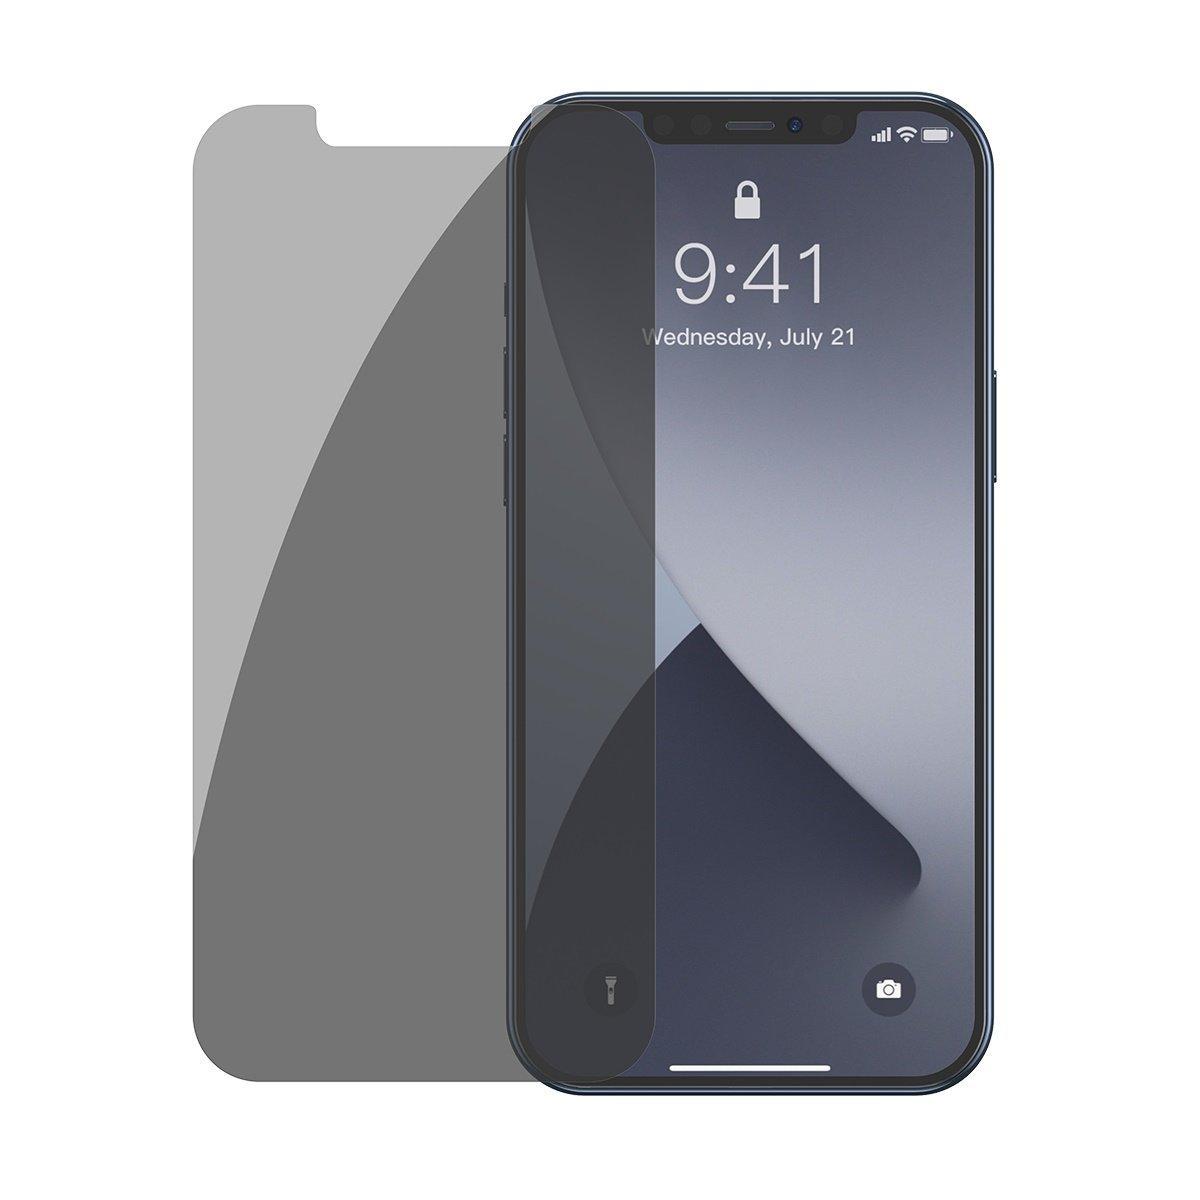 Pachet 2 folii de sticla pentru iPhone 12 / 12 Pro, Tenta fumurie, Privacy Glass, 6.1 inch imagine